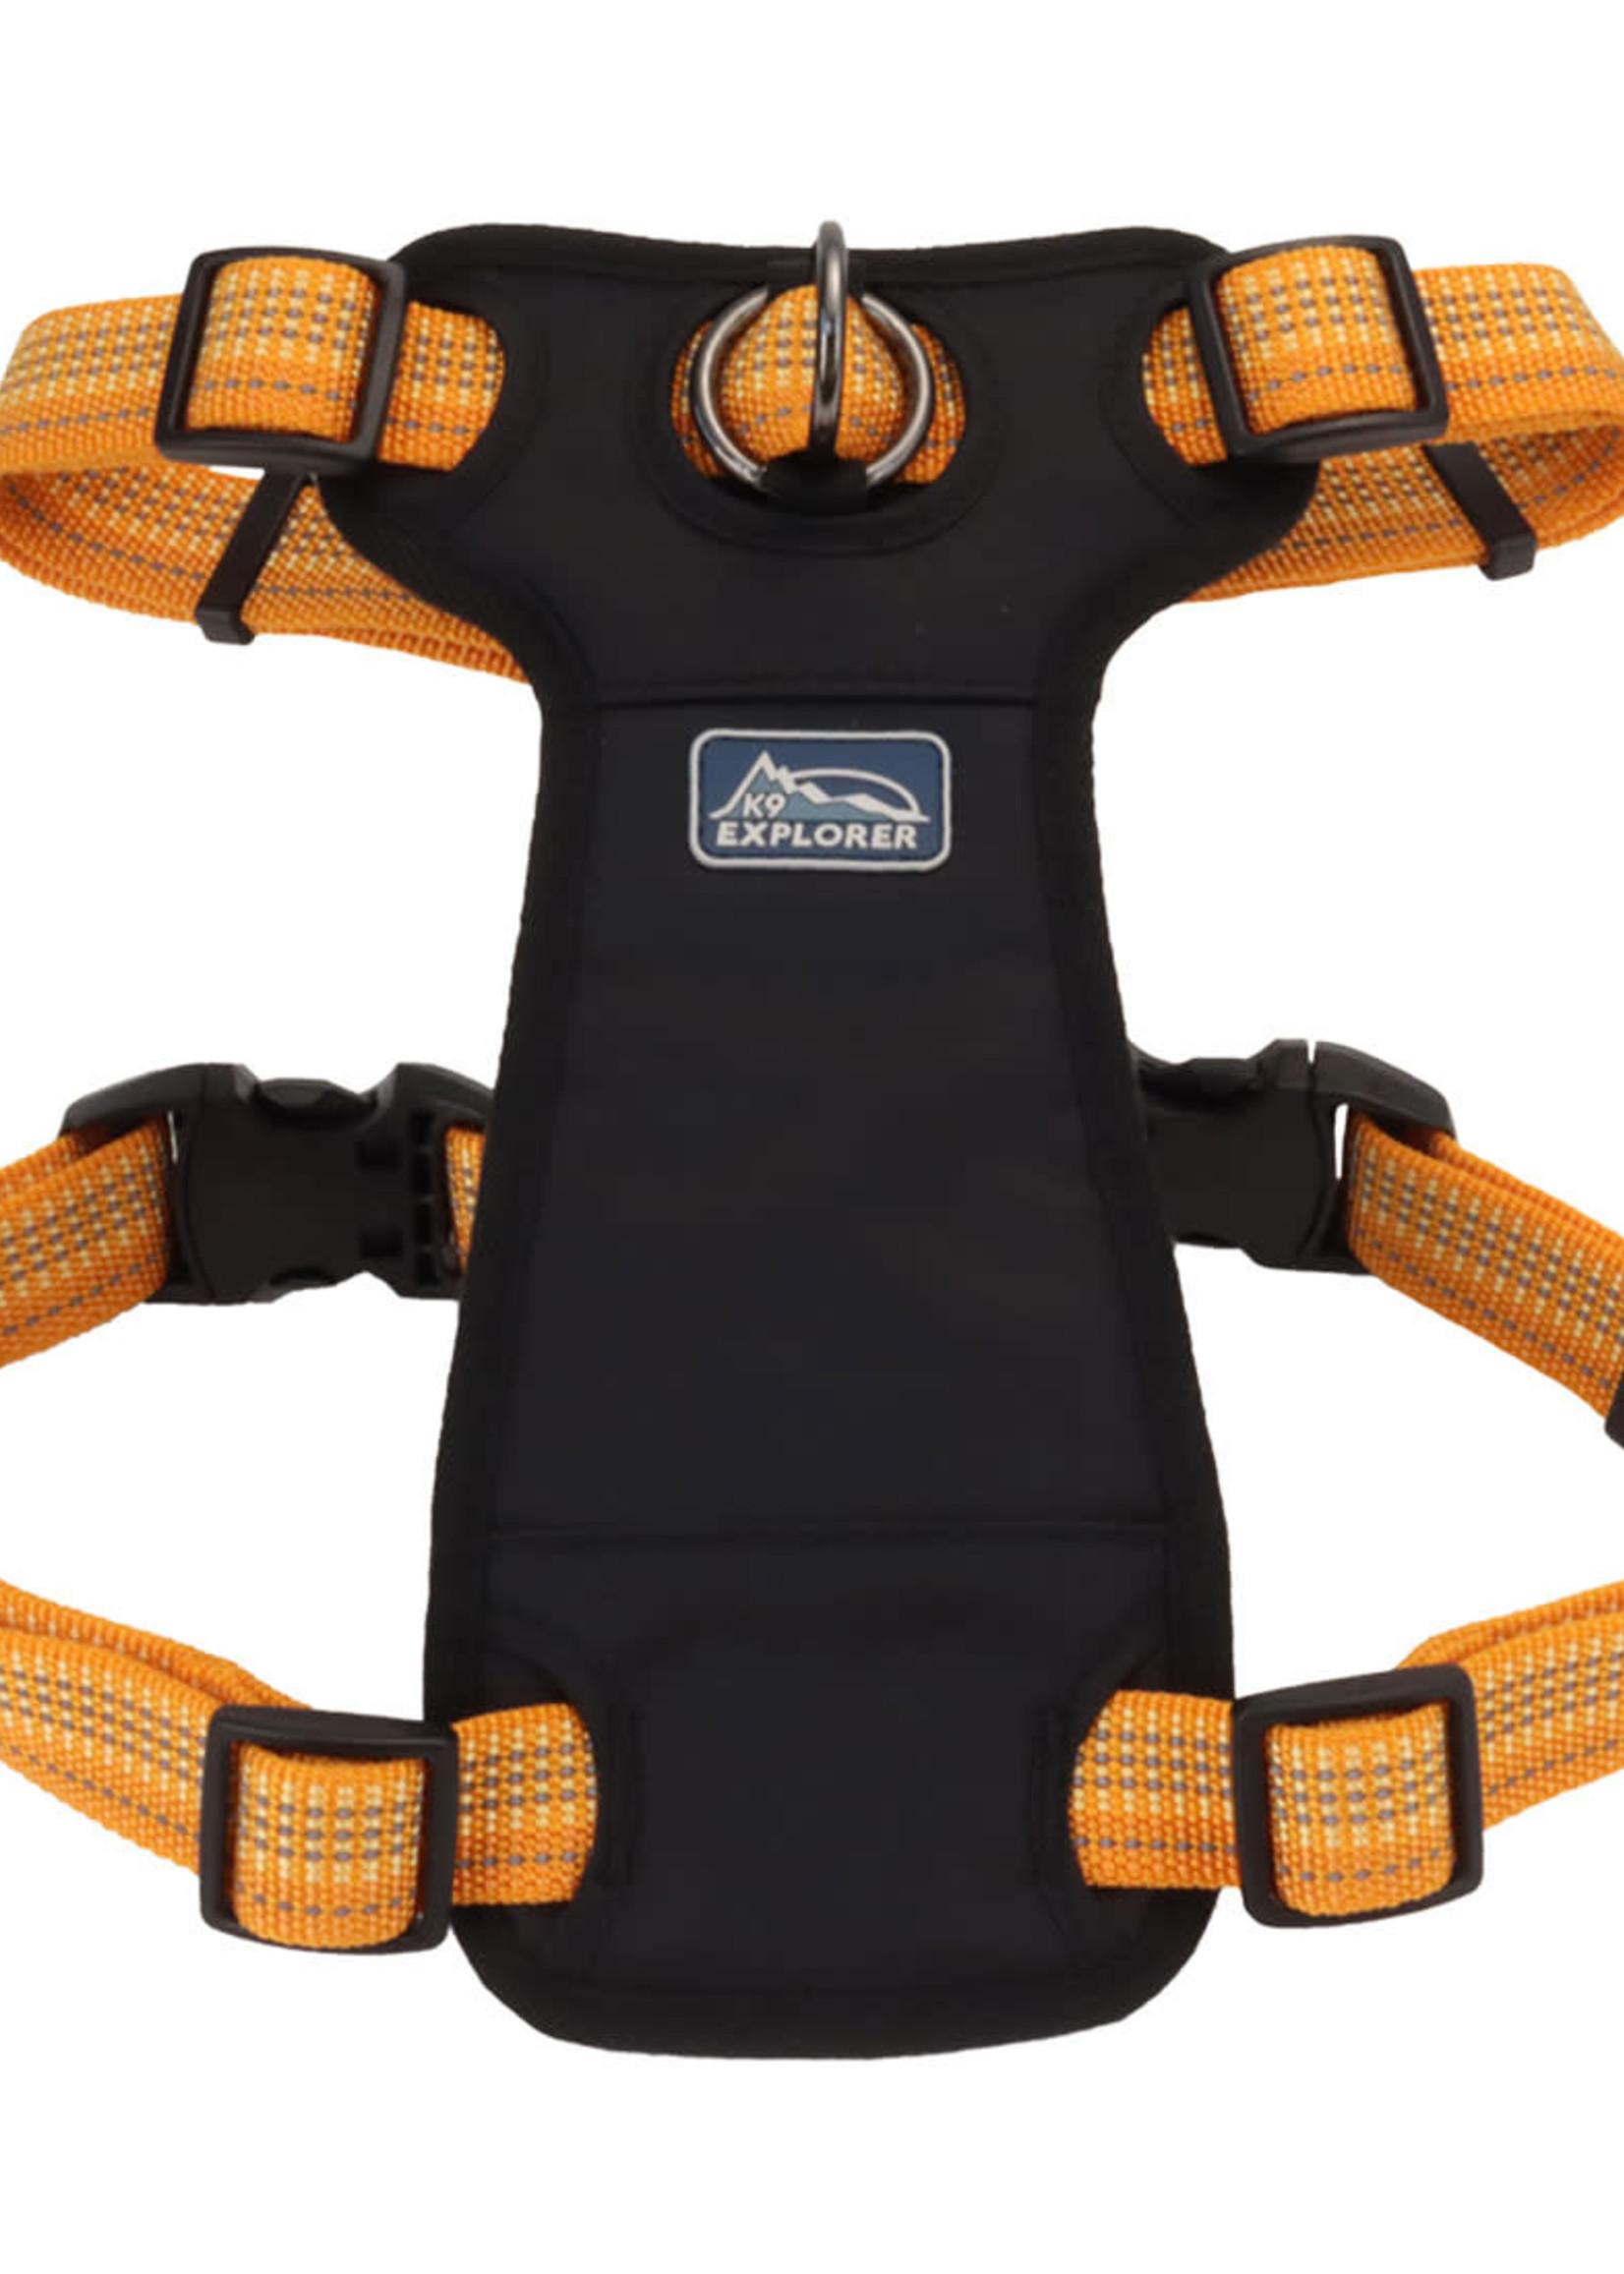 K9 Explorer® Coastal K9 Explorer Brights Reflective Front-Connect Harness X-Small